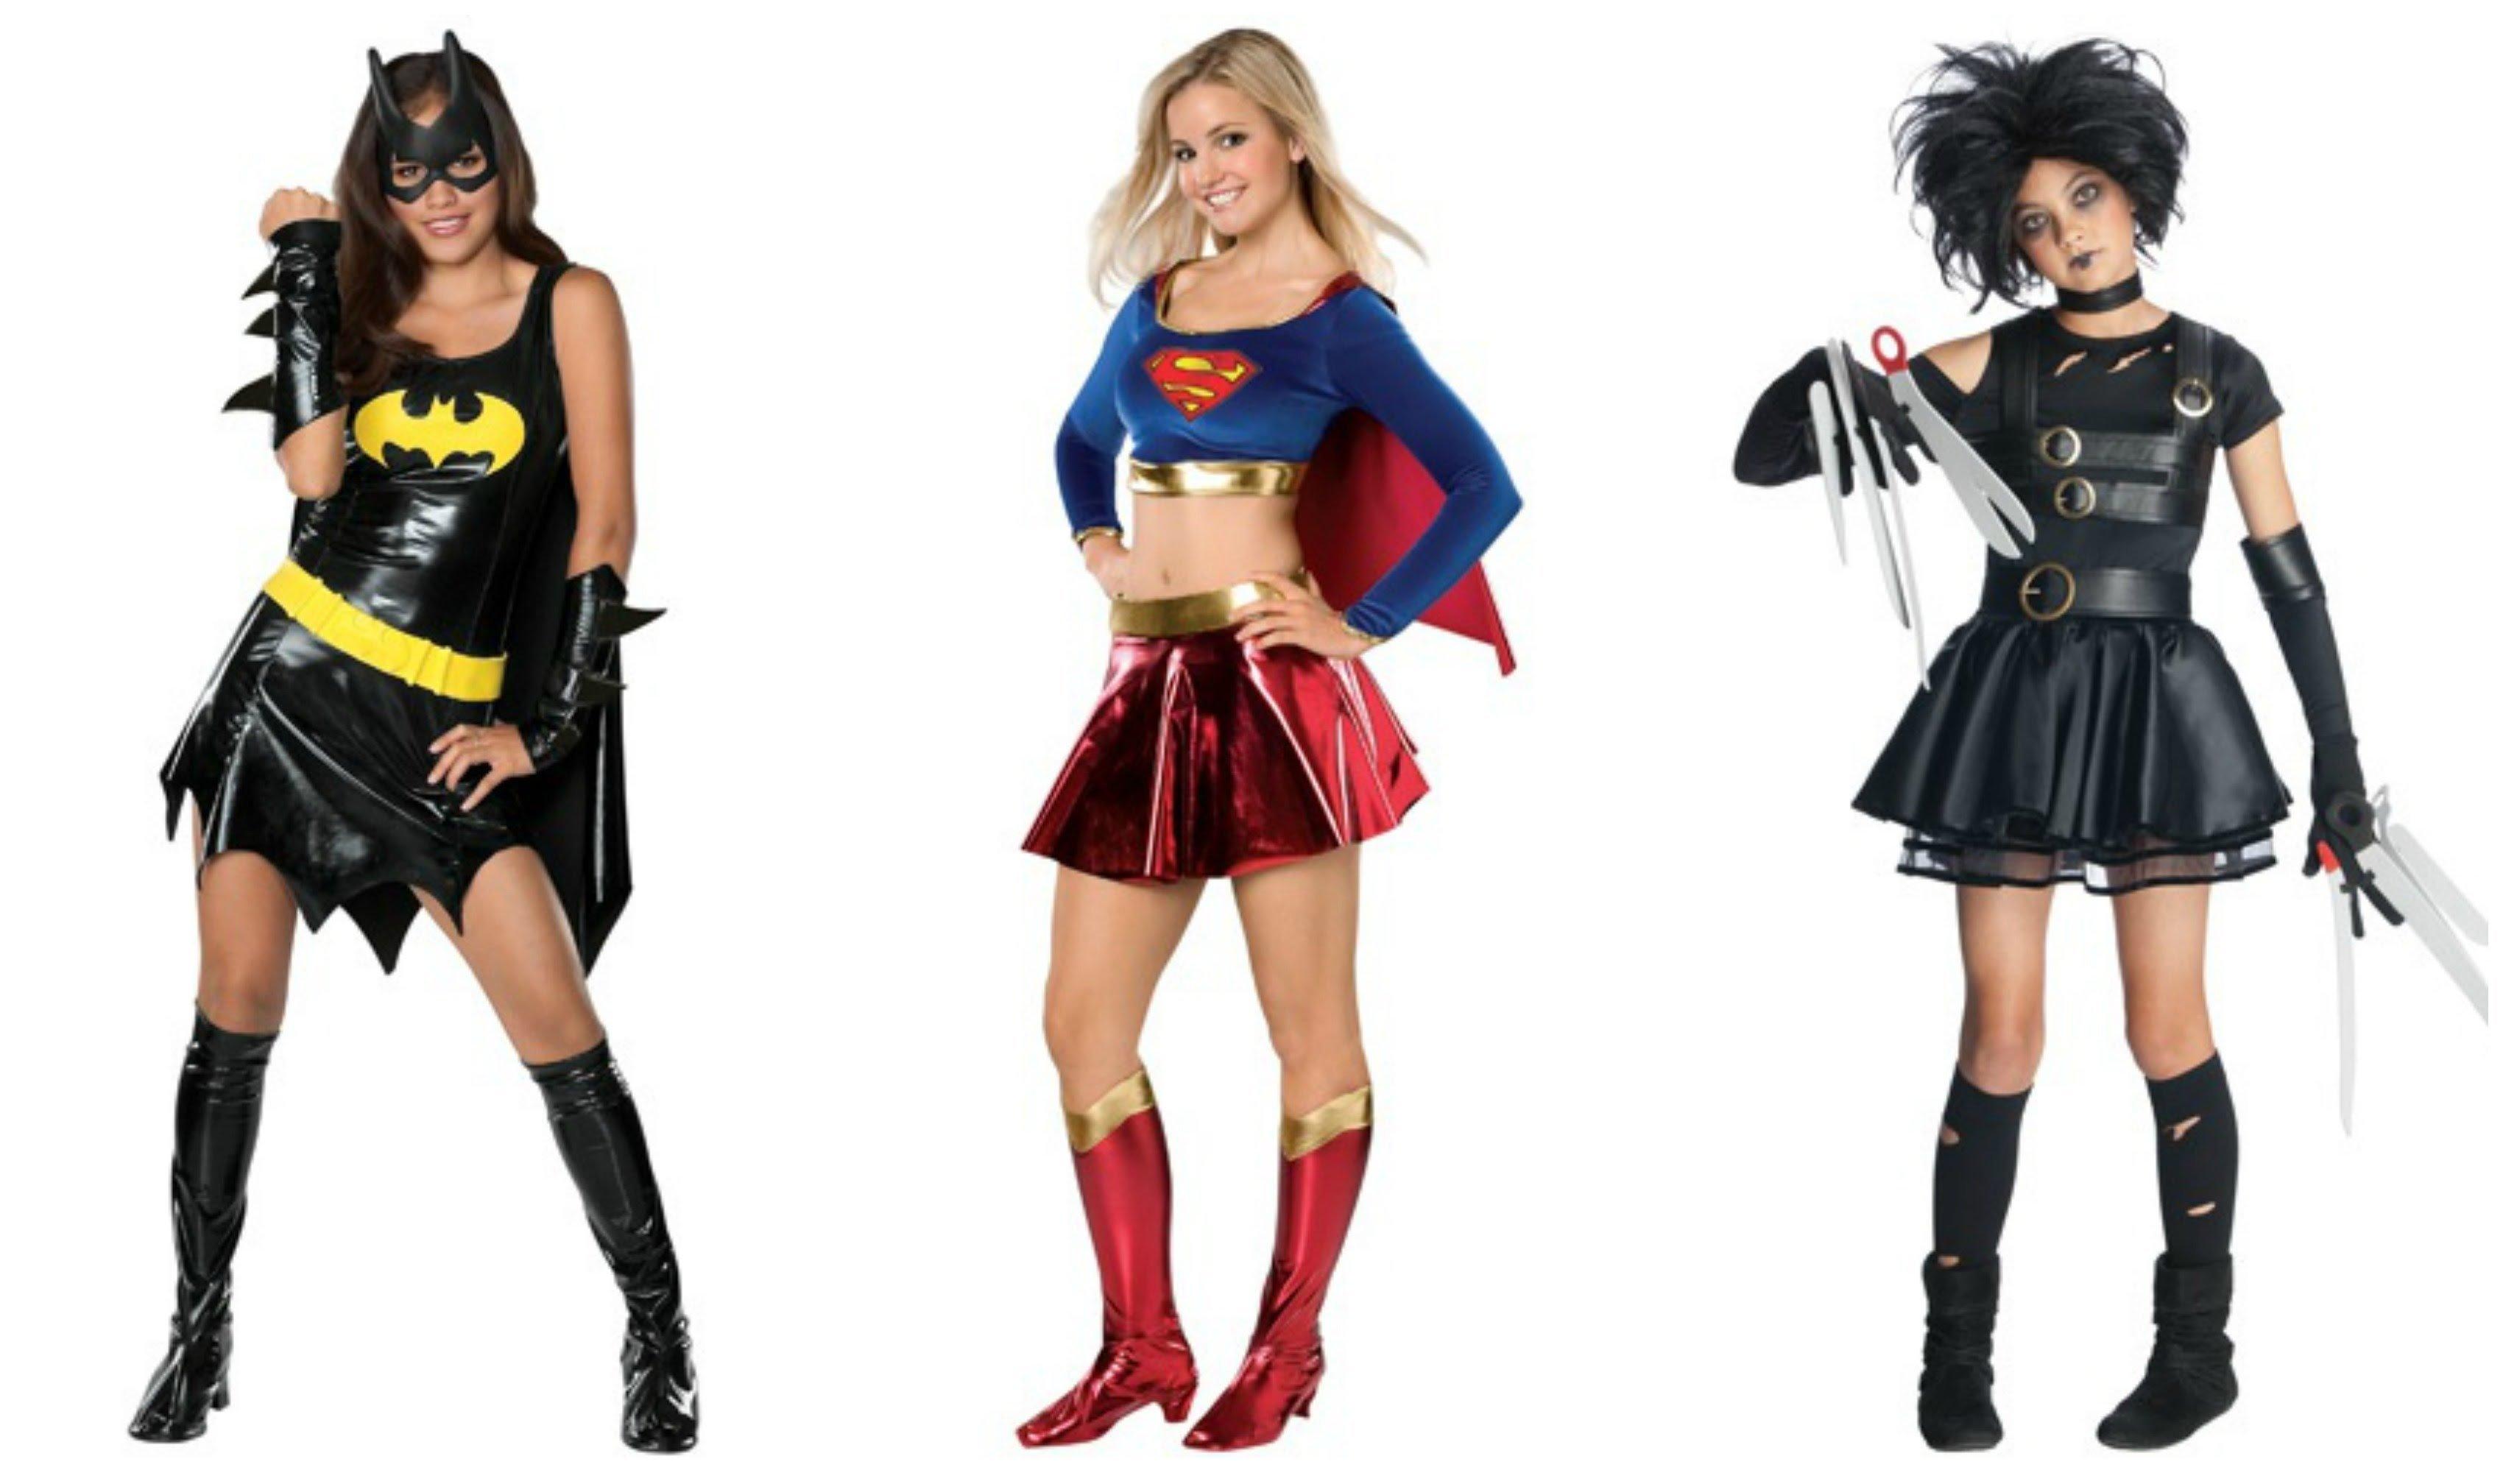 10 Fantastic Halloween Costumes For Teenage Girls Ideas halloween costume ideas for teens girls youtube halloween costumes 5 2020